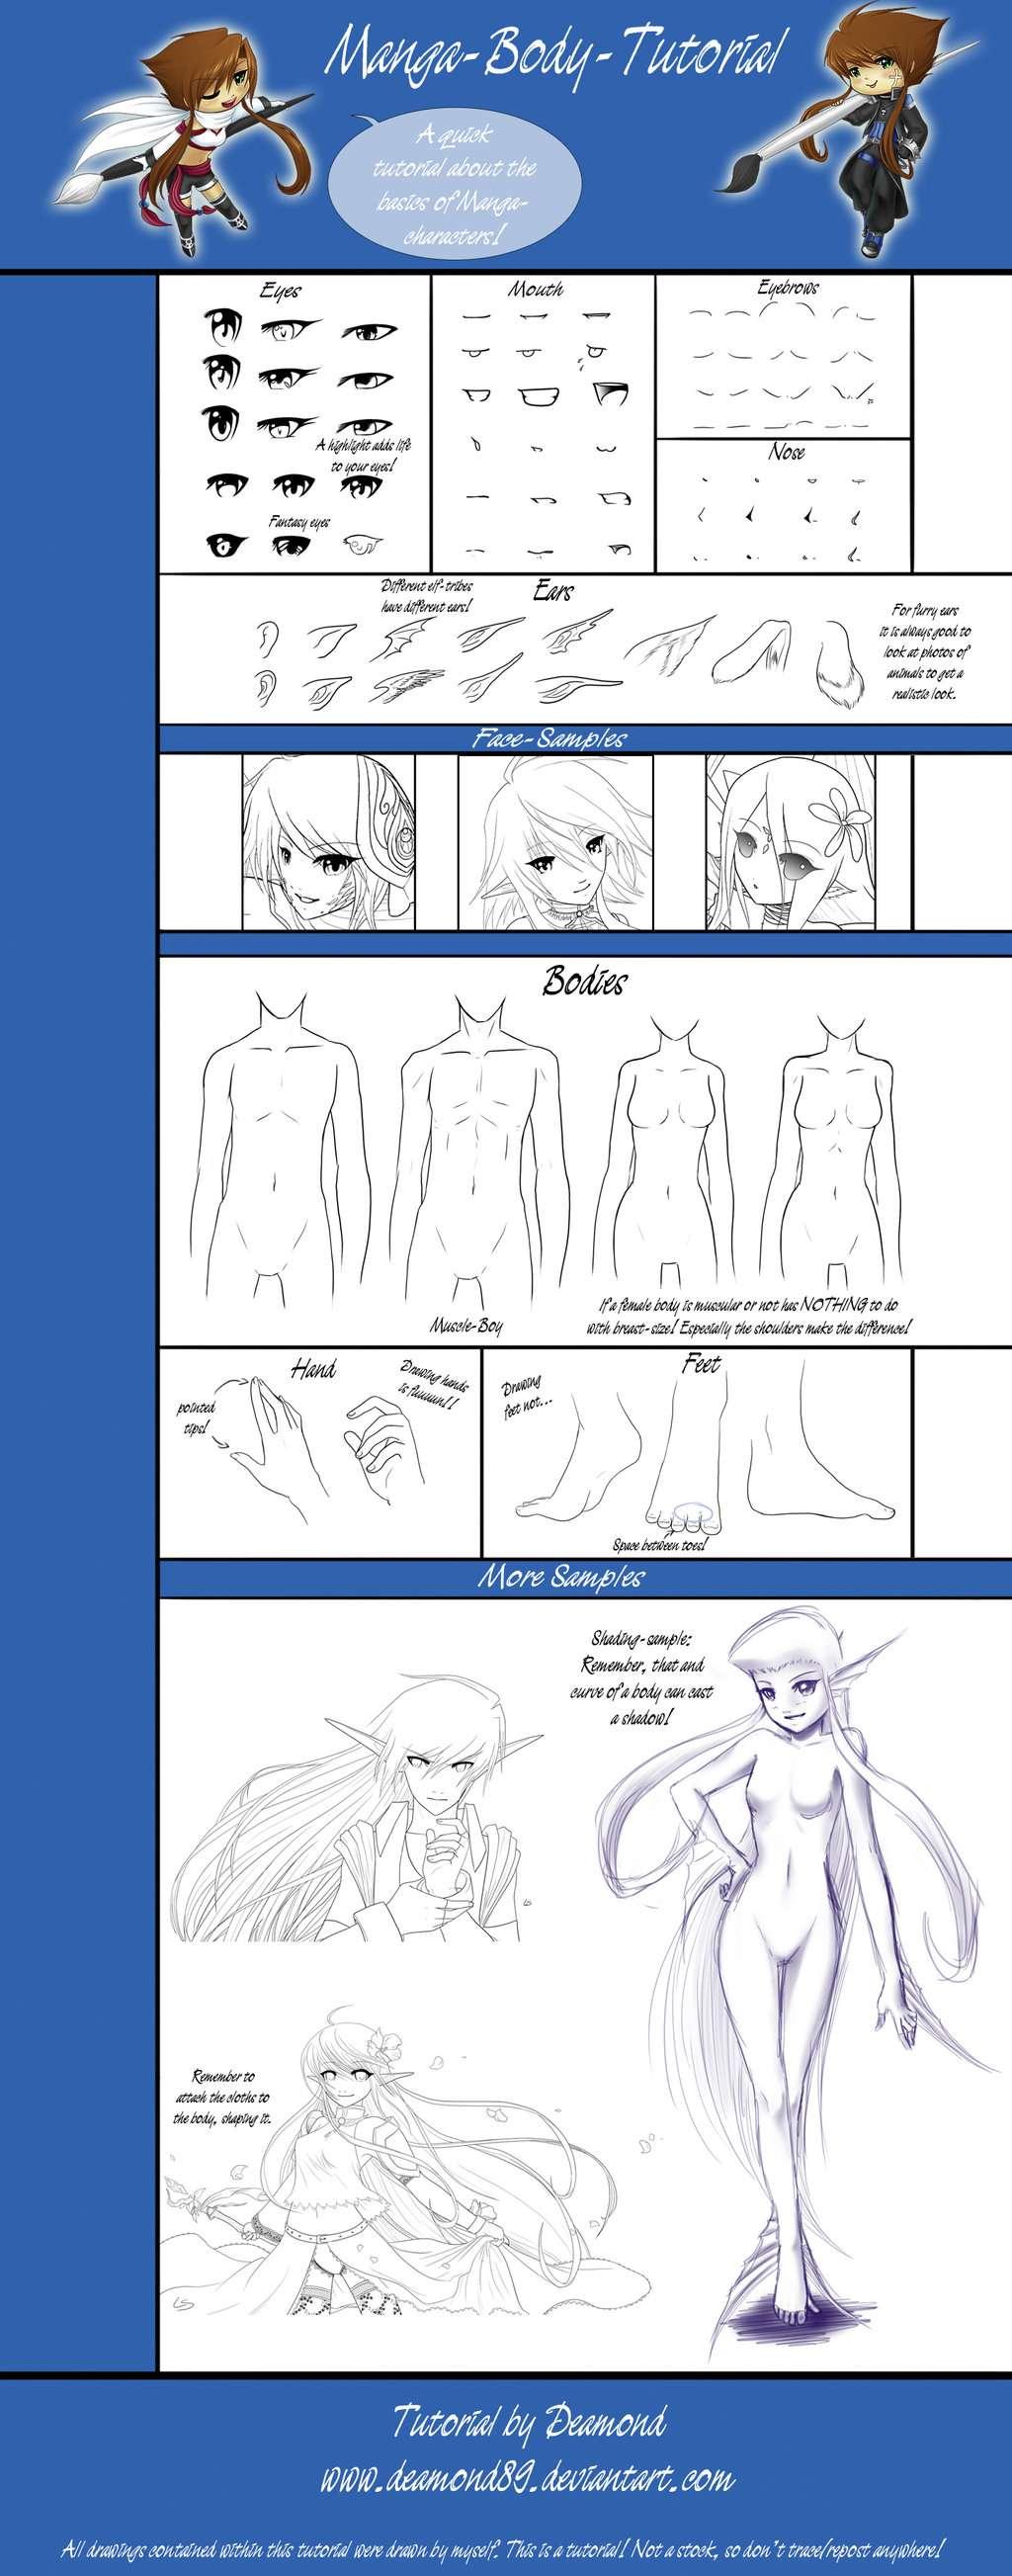 Vos dessins hors sujet - Page 4 Corps110